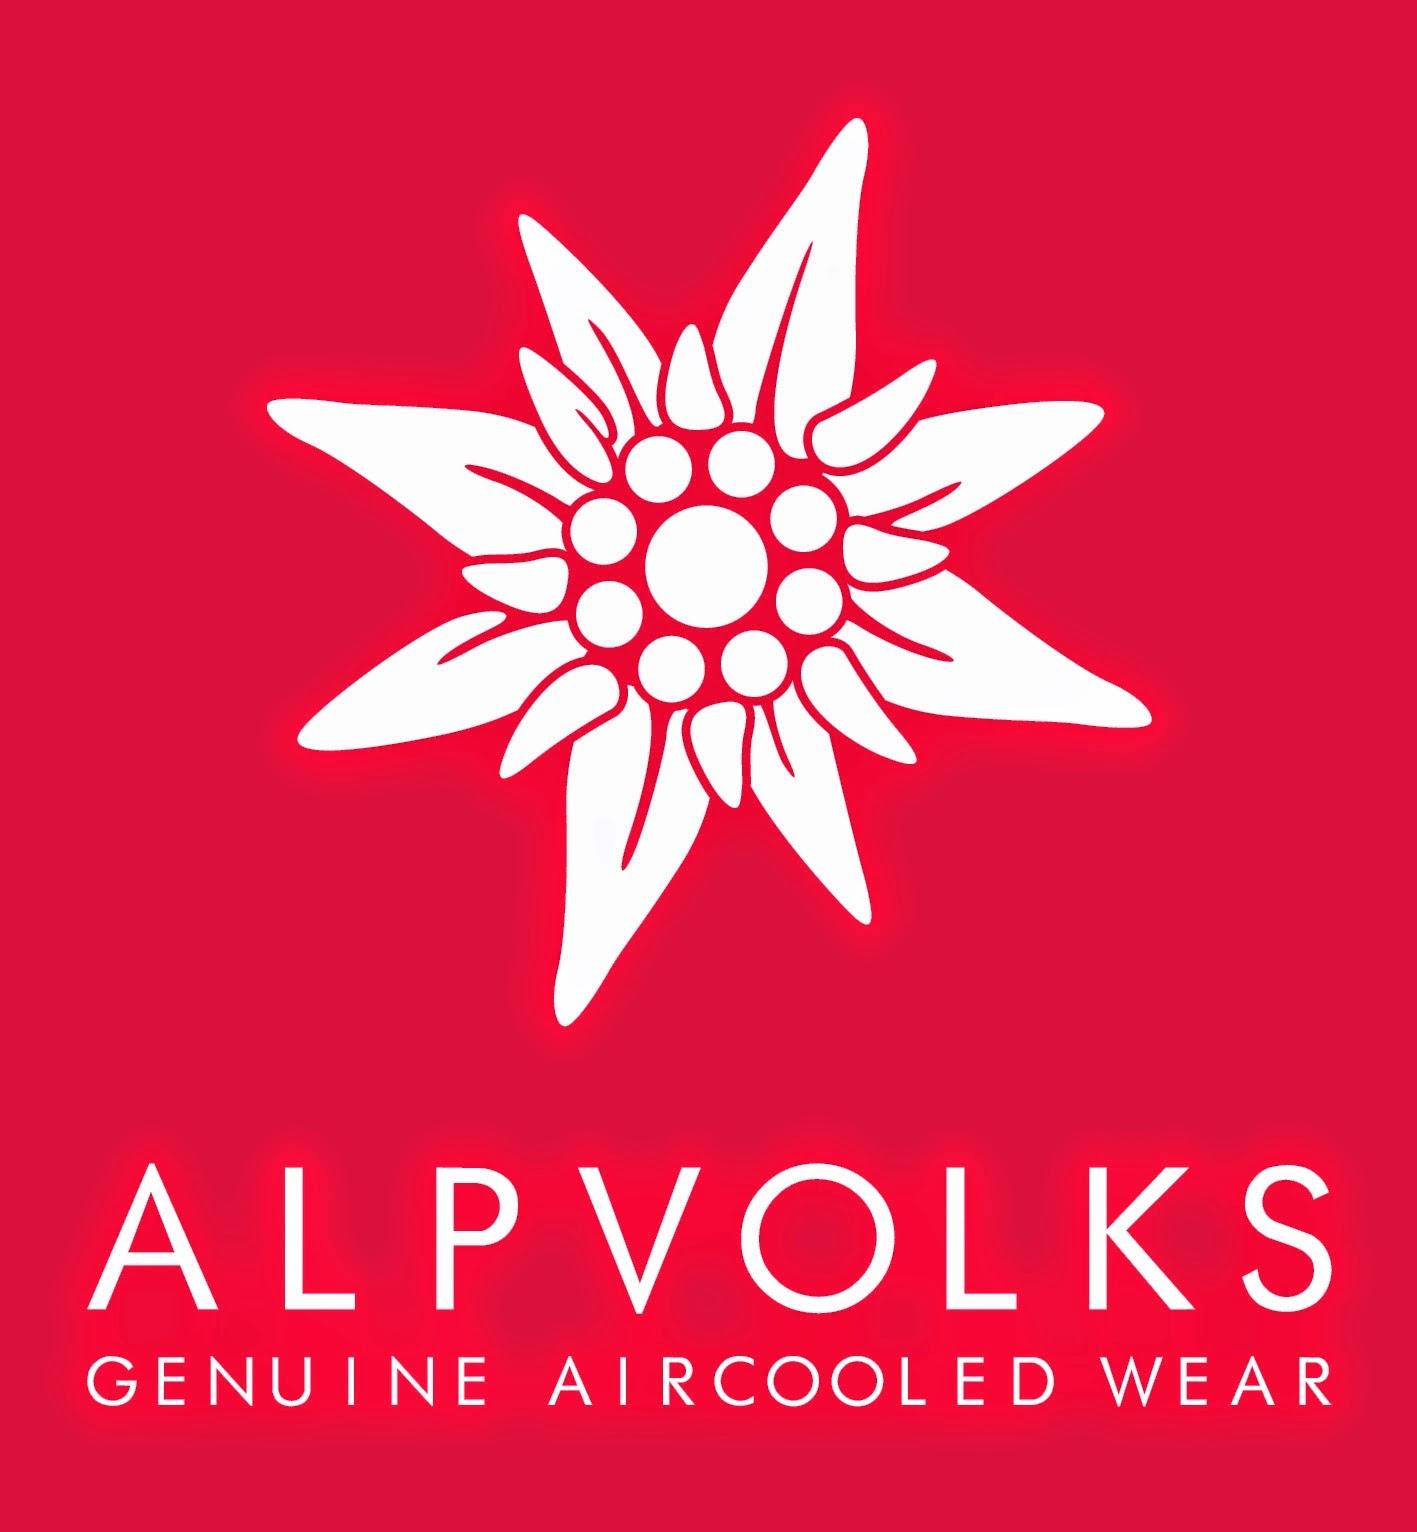 ALPVOLKS